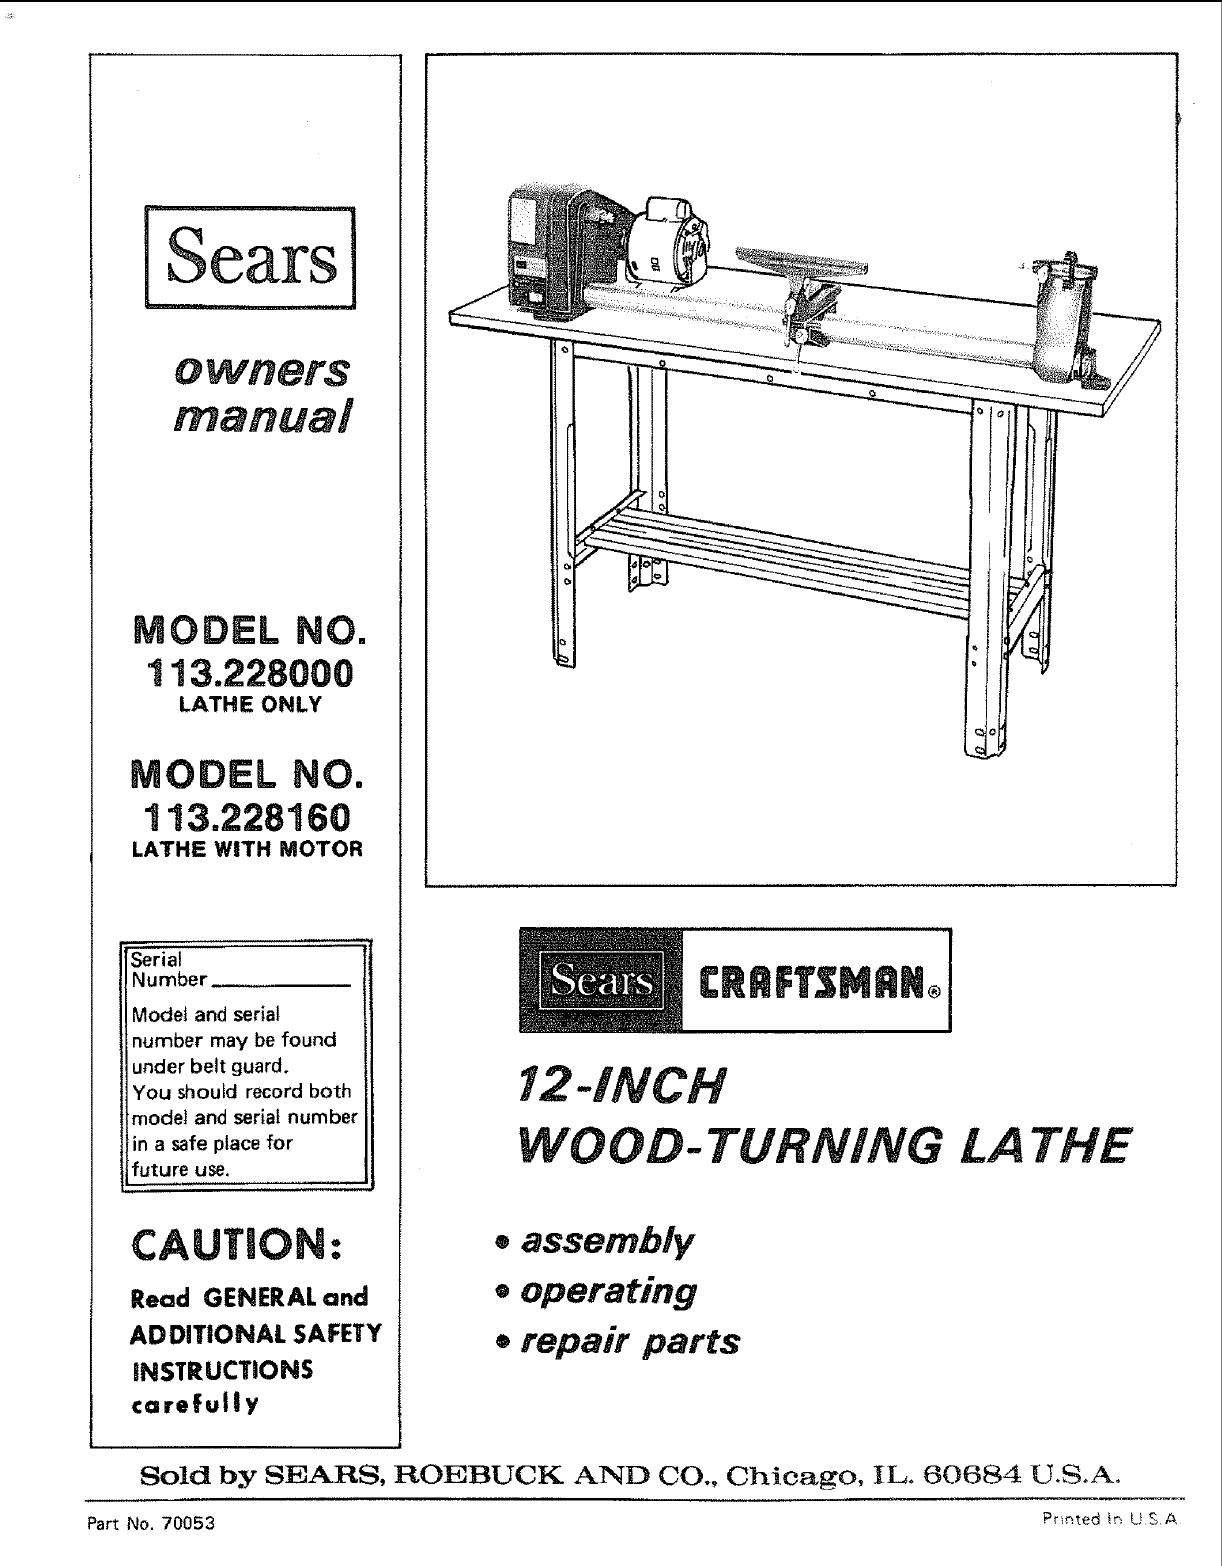 Phenomenal Craftsman 113228000 User Manual 12 Wood Turning Lathe Machost Co Dining Chair Design Ideas Machostcouk